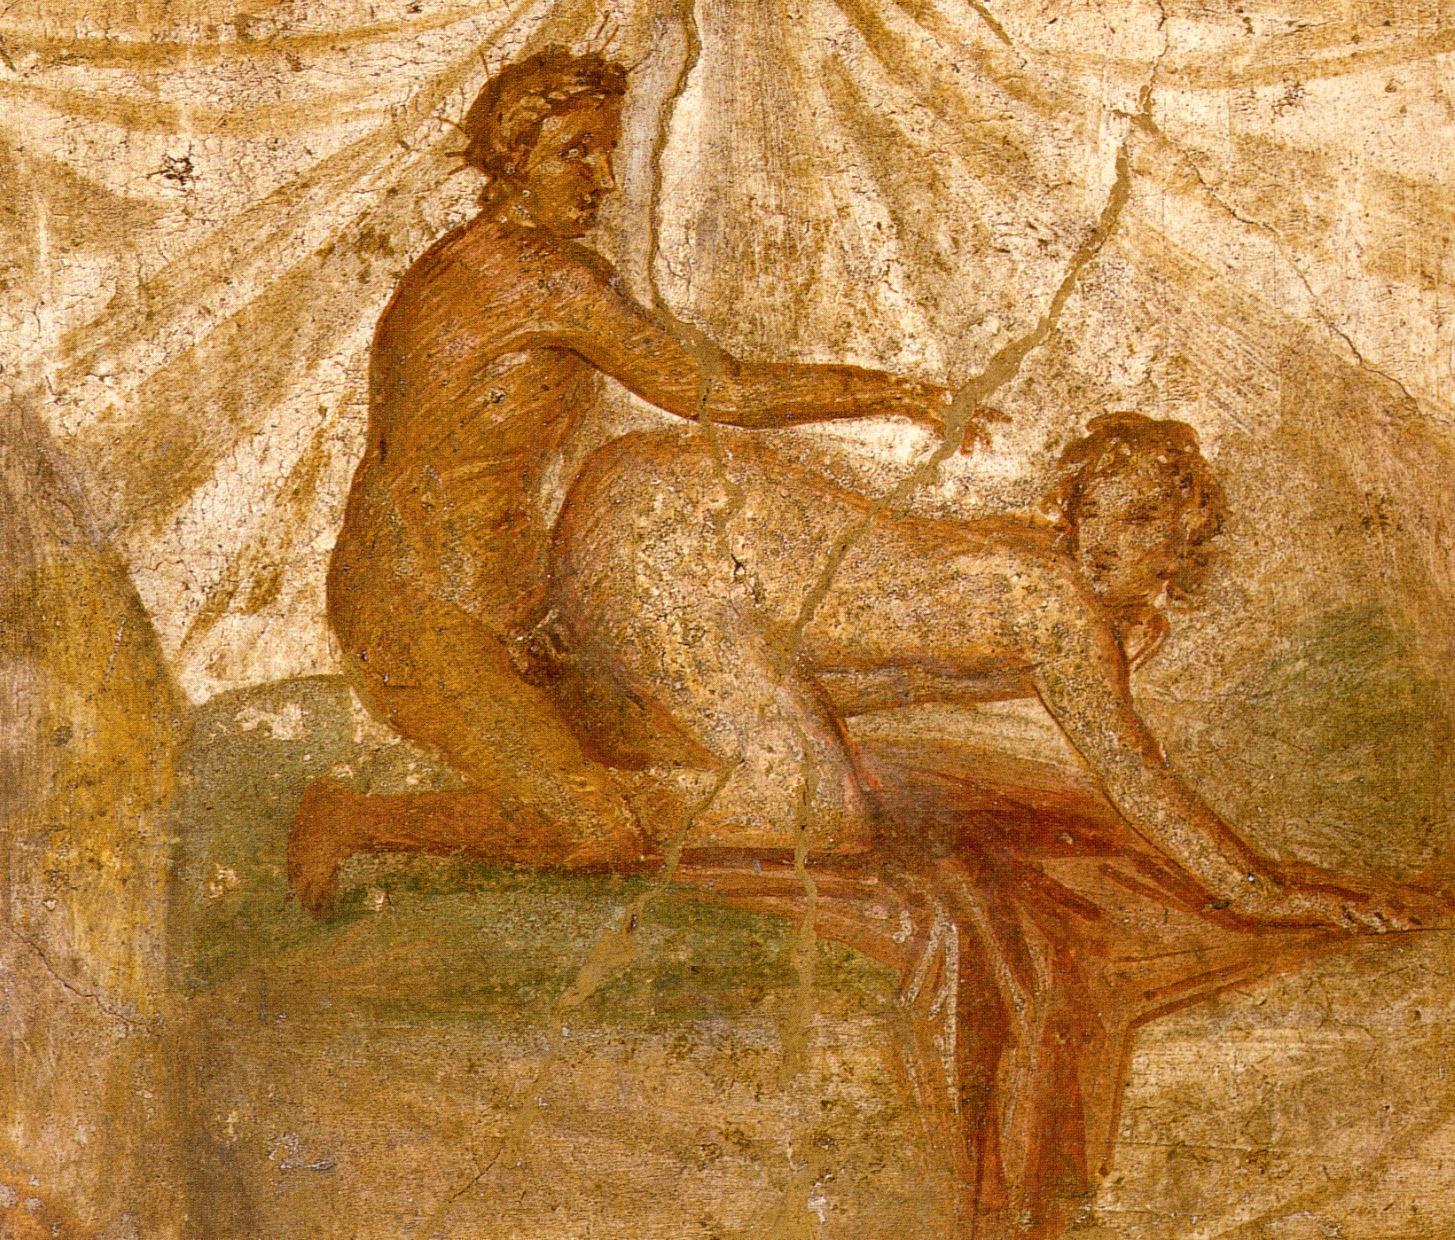 Эротика в древней греции фото 7 фотография